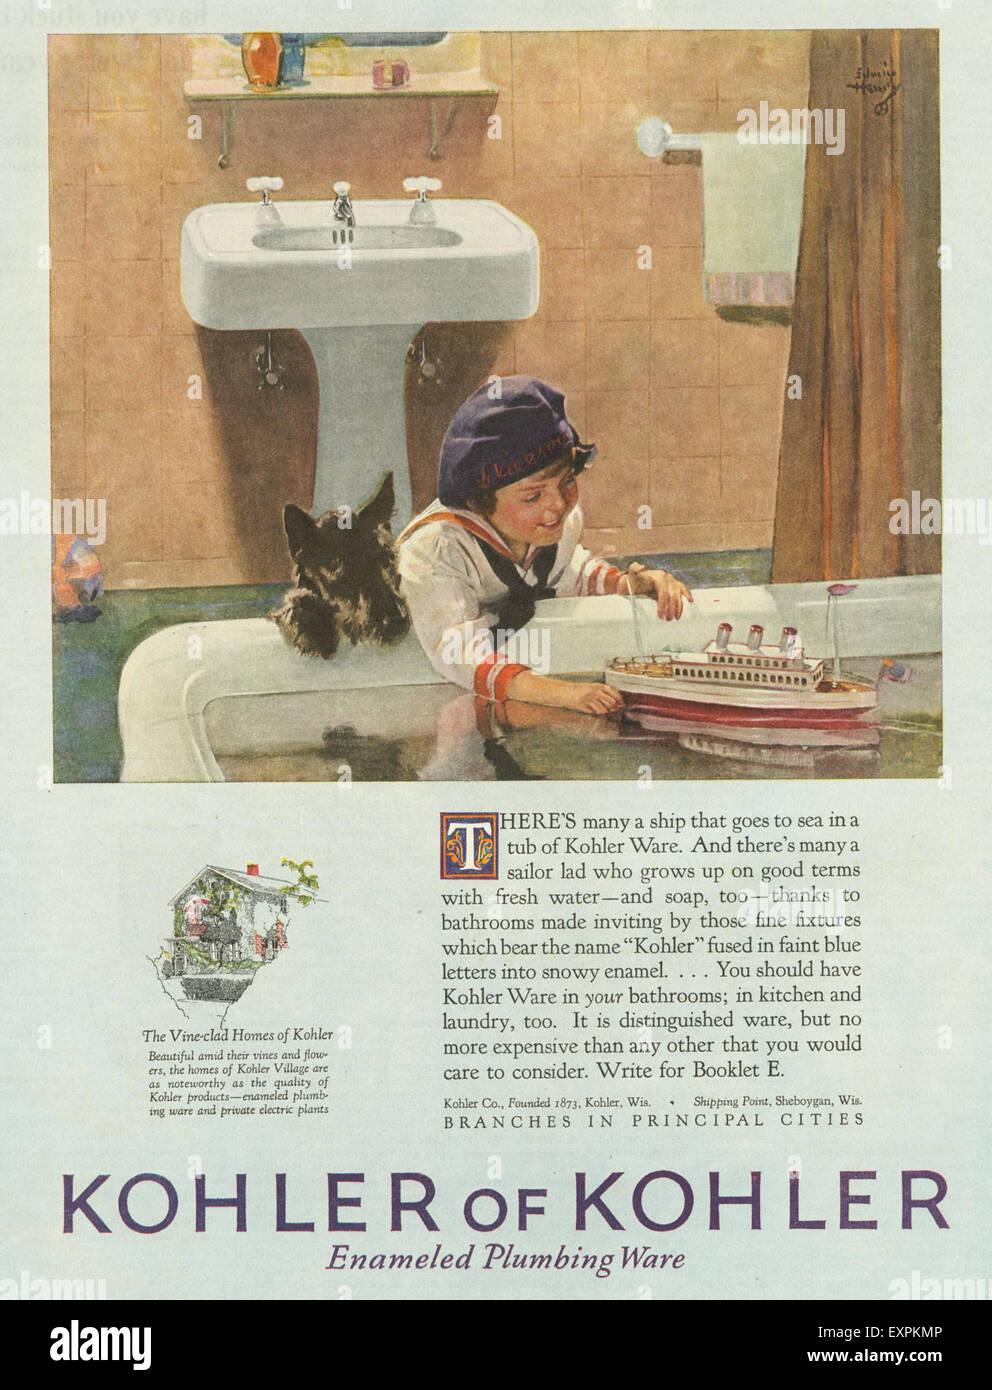 1920s USA Kohler Bathrooms Magazine Advert Stock Photo: 85320950 ...